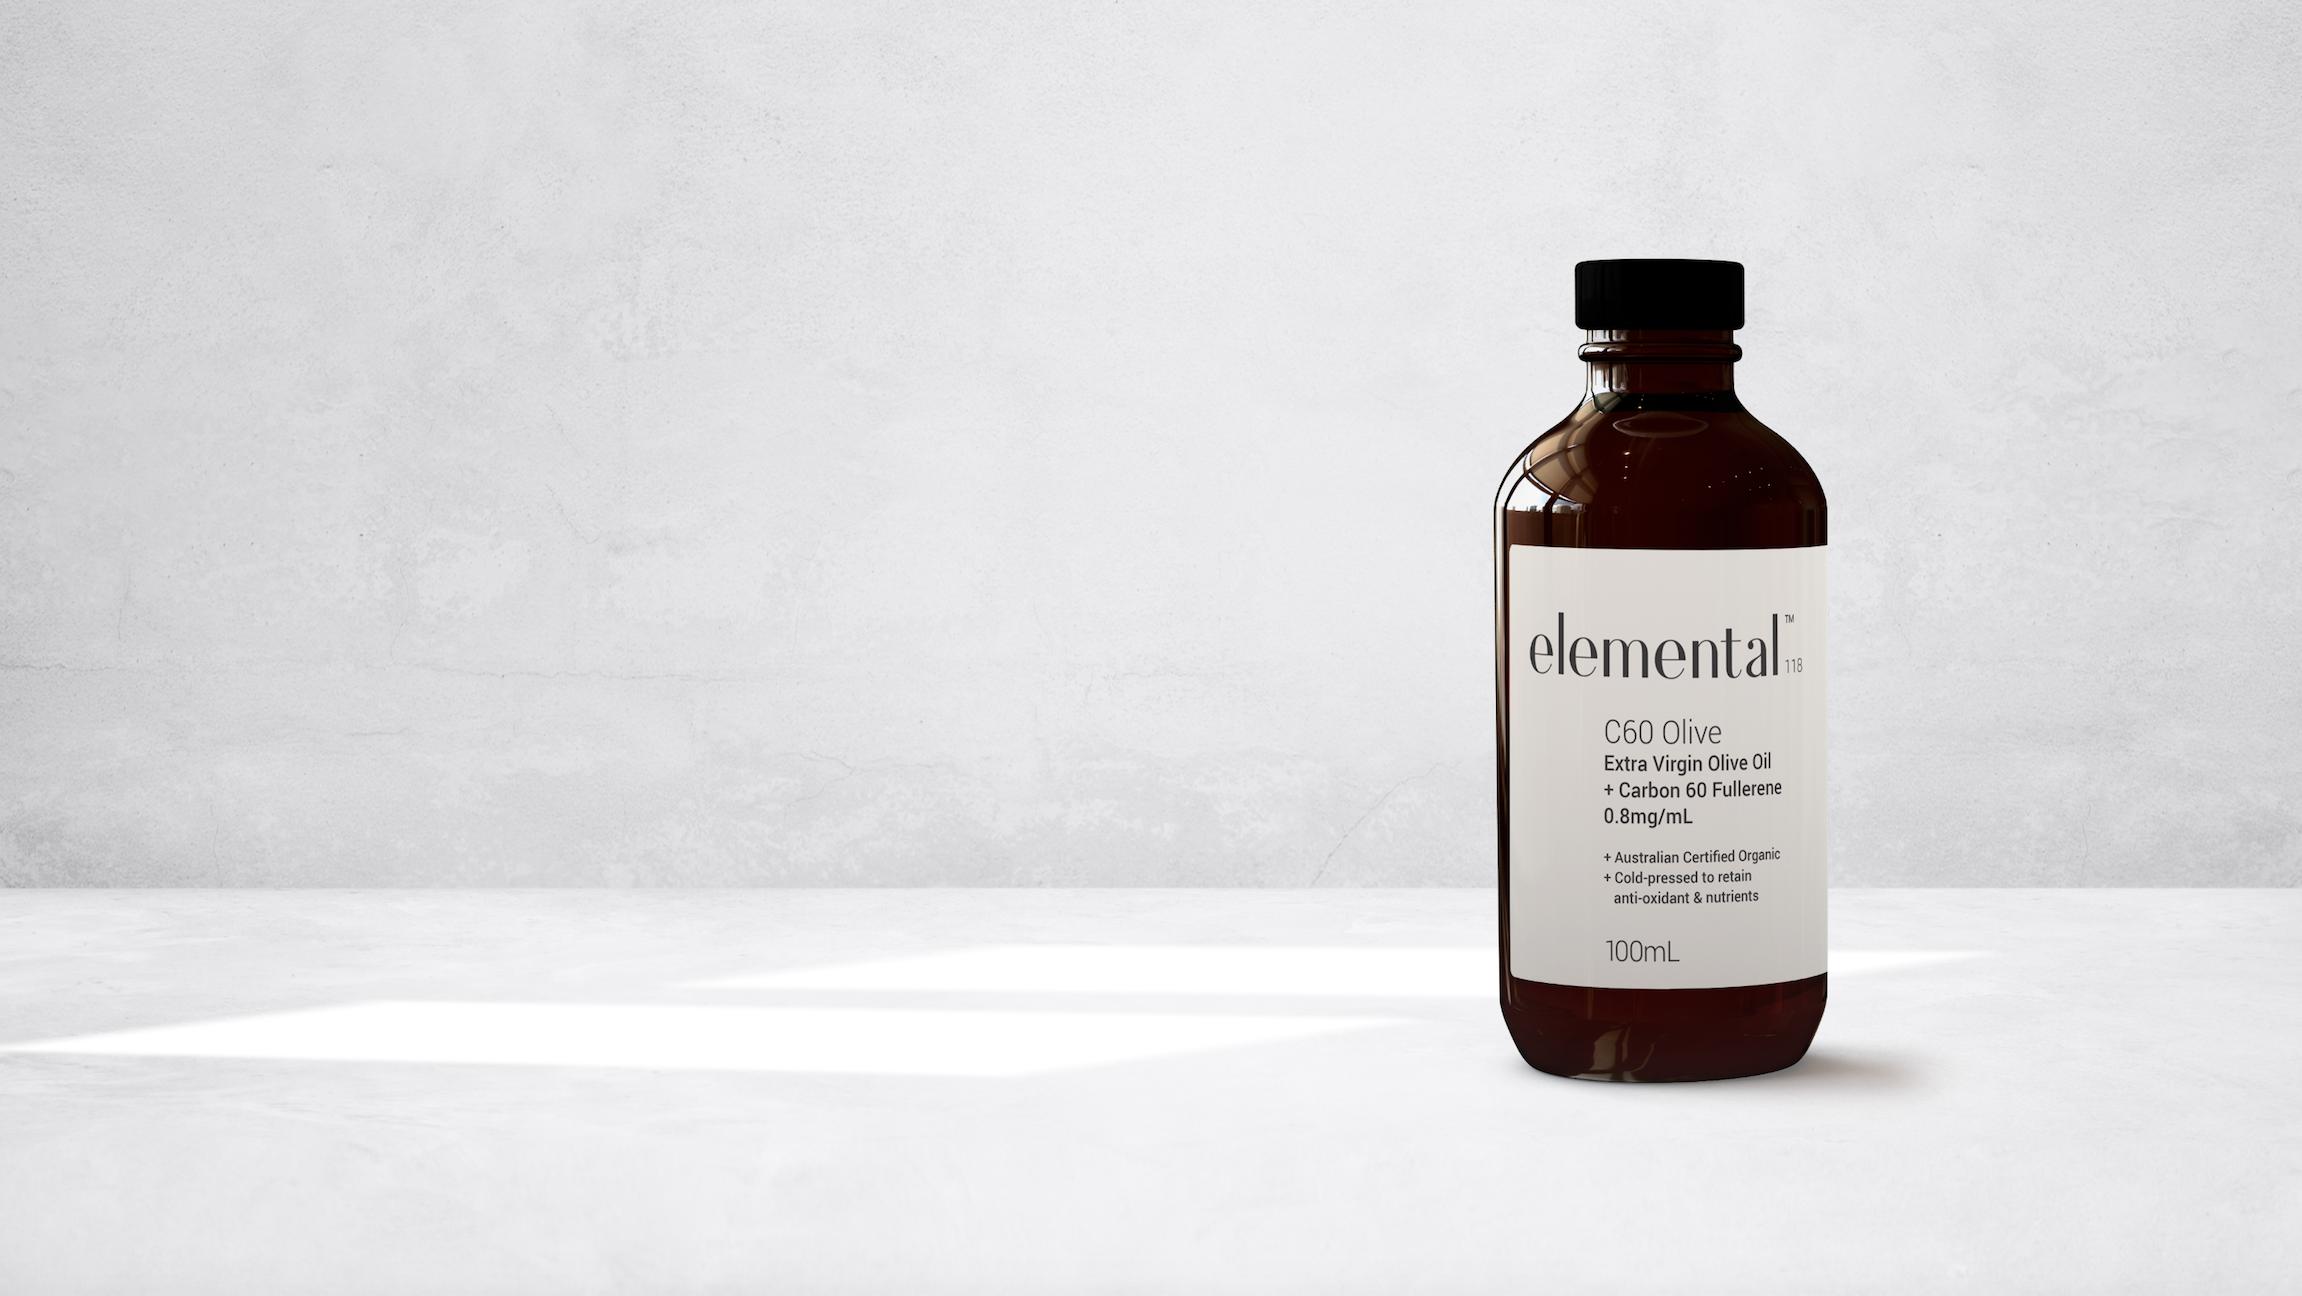 Elemental118